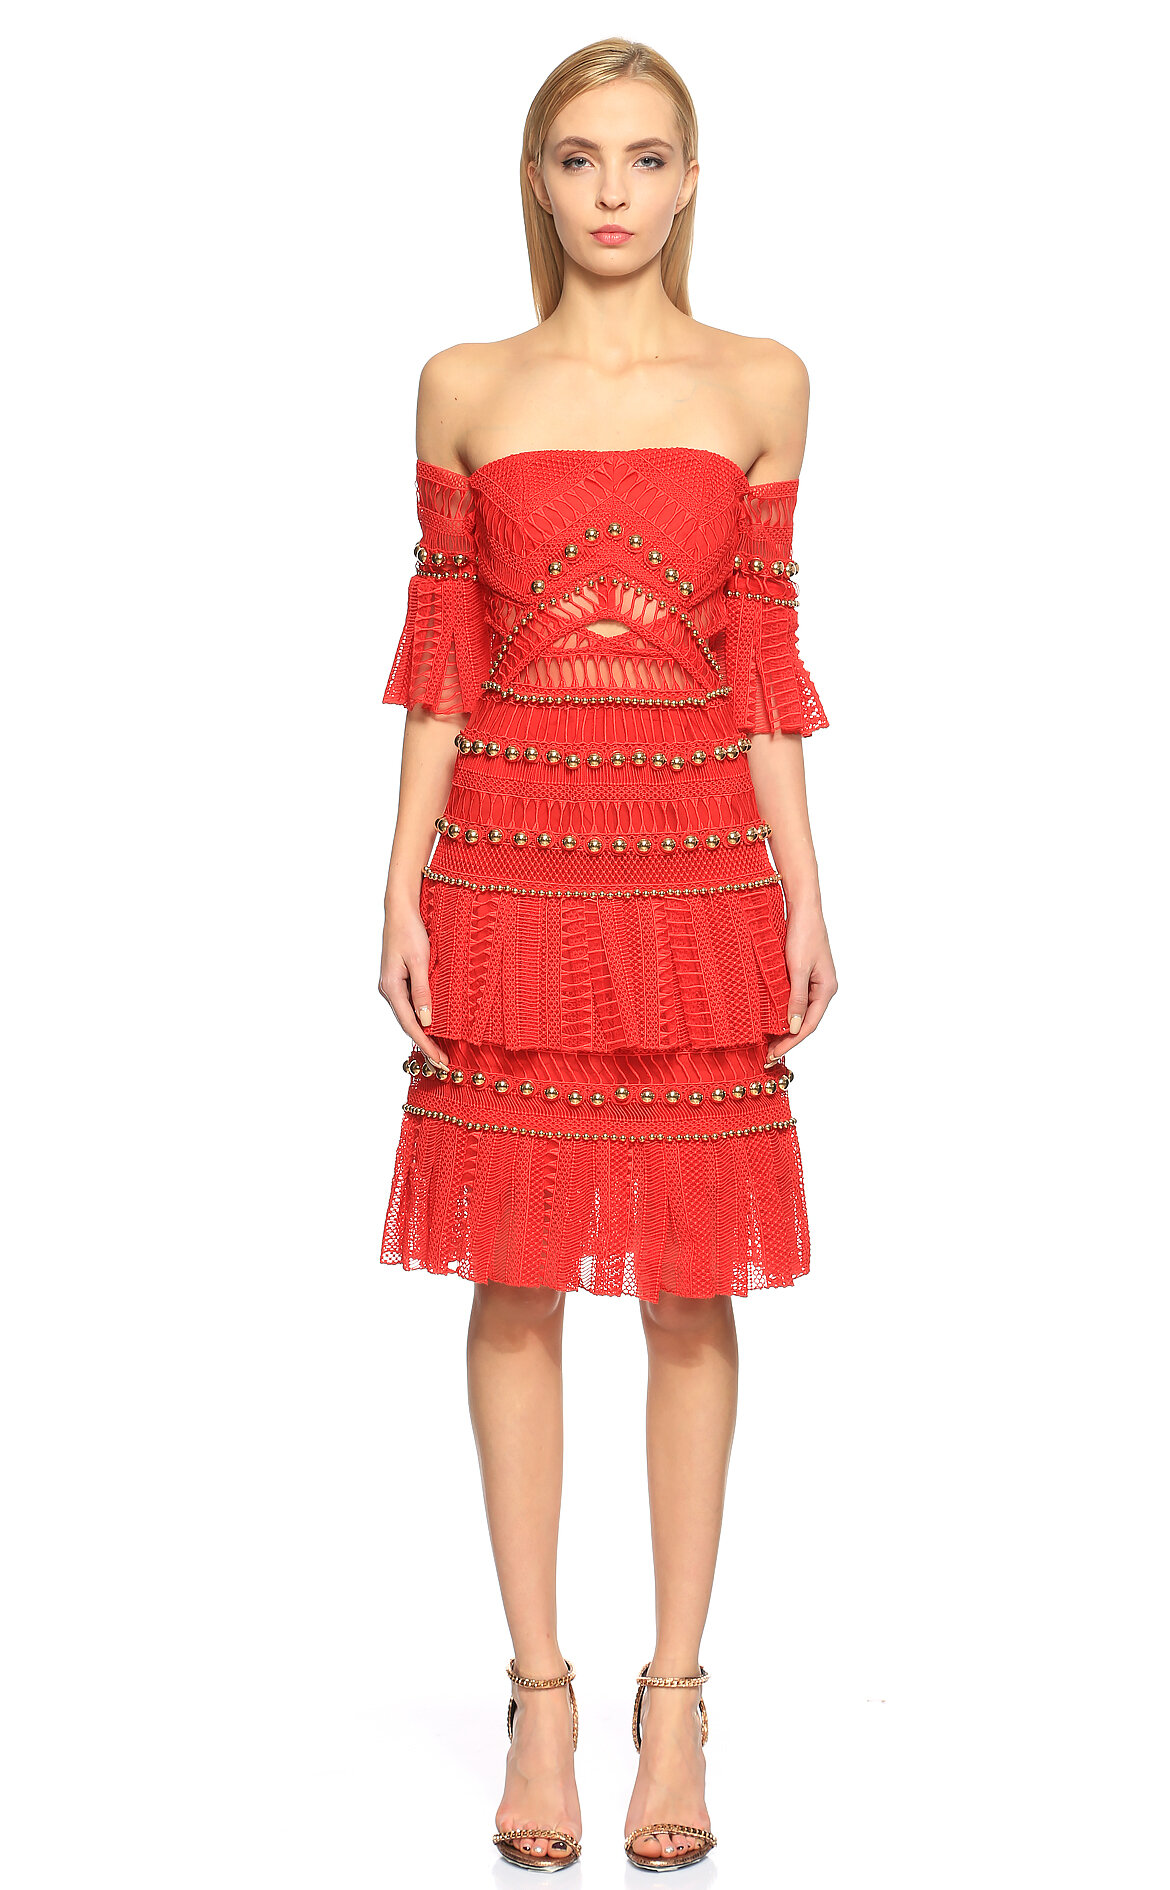 Thurley-Thurley Straplez Elbise